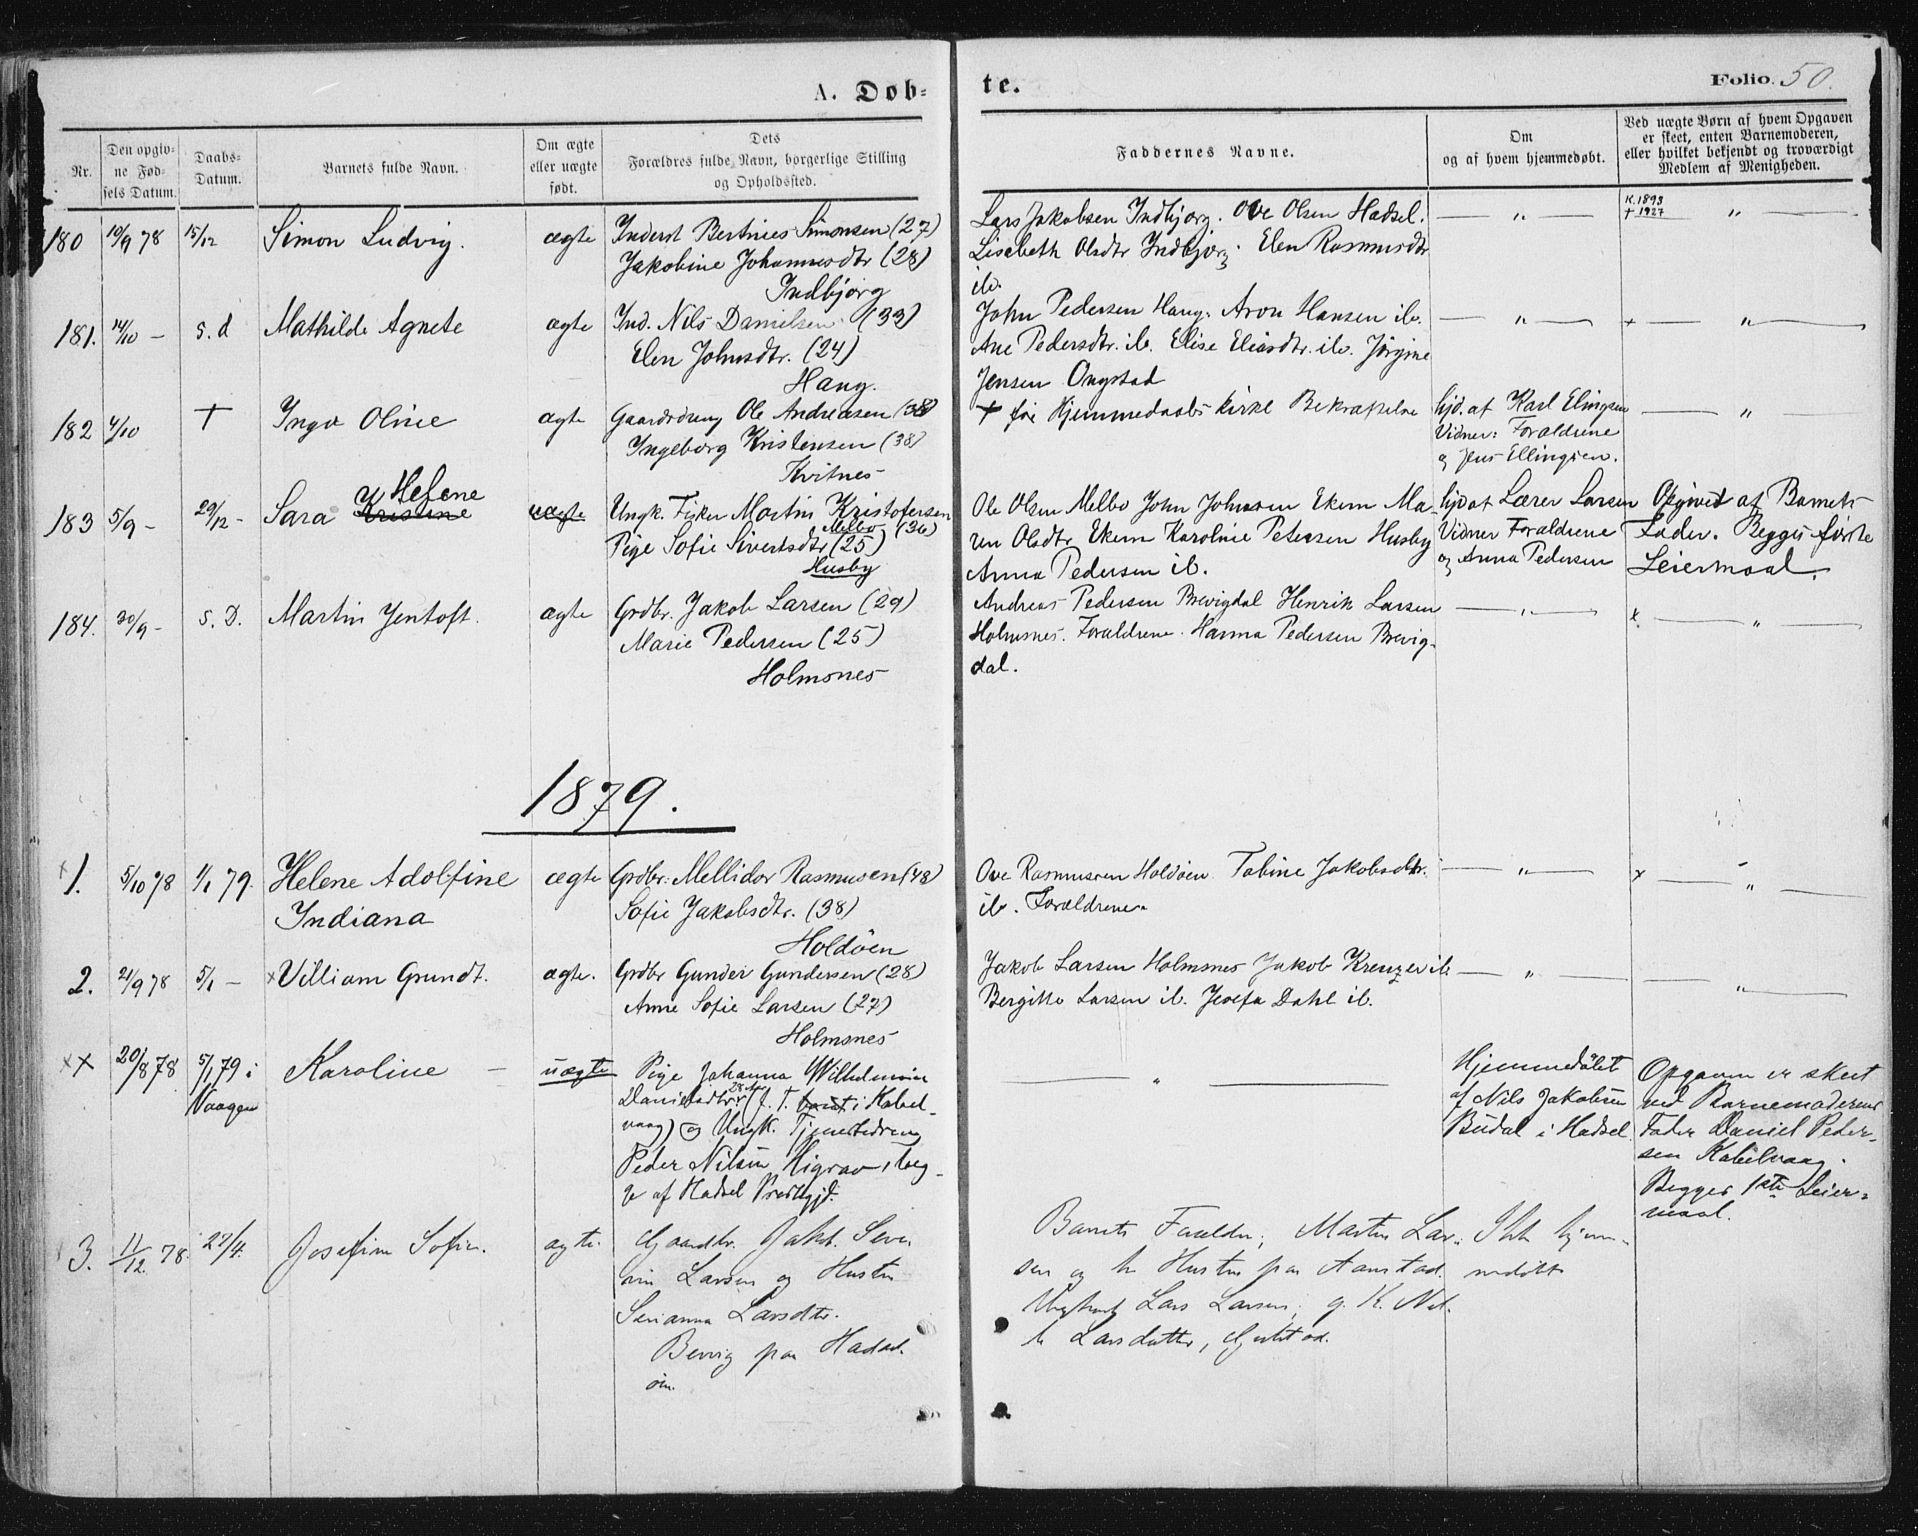 SAT, Ministerialprotokoller, klokkerbøker og fødselsregistre - Nordland, 888/L1243: Ministerialbok nr. 888A09, 1876-1879, s. 50